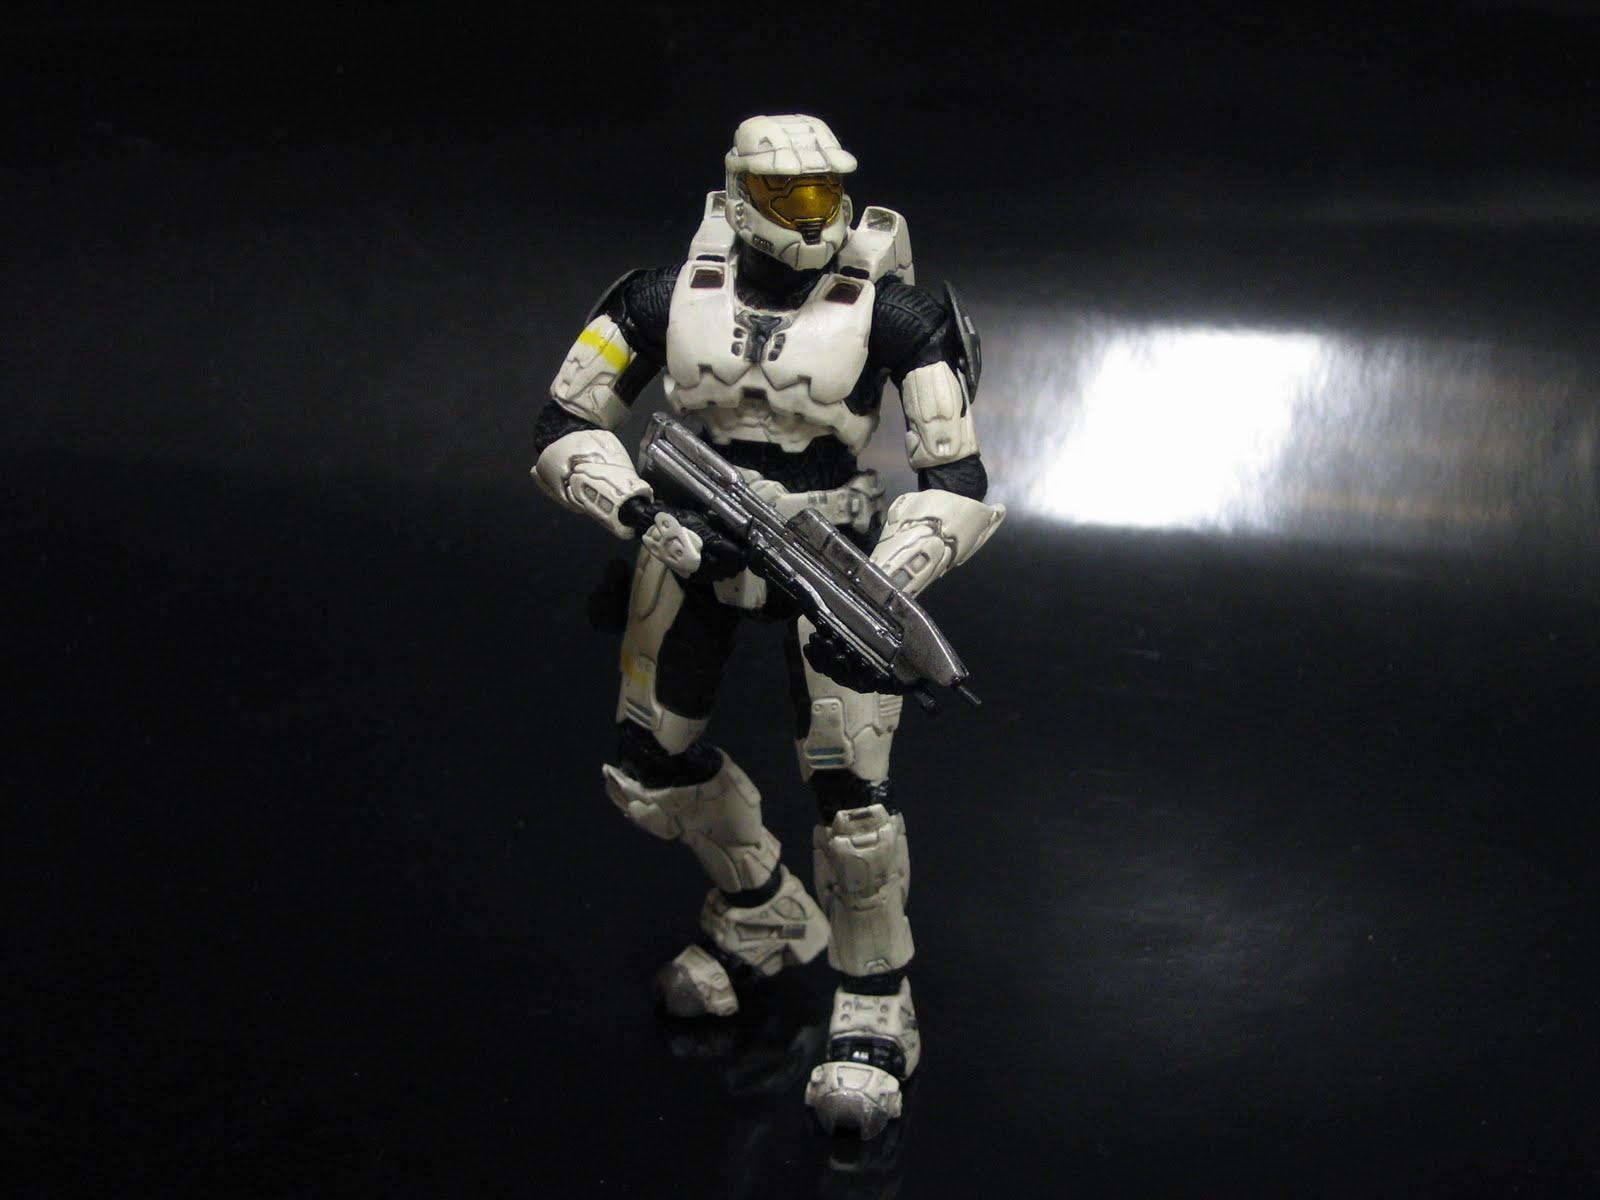 Crazy Wookie Cookies: McFarlane Halo: Series 1 White Spartan